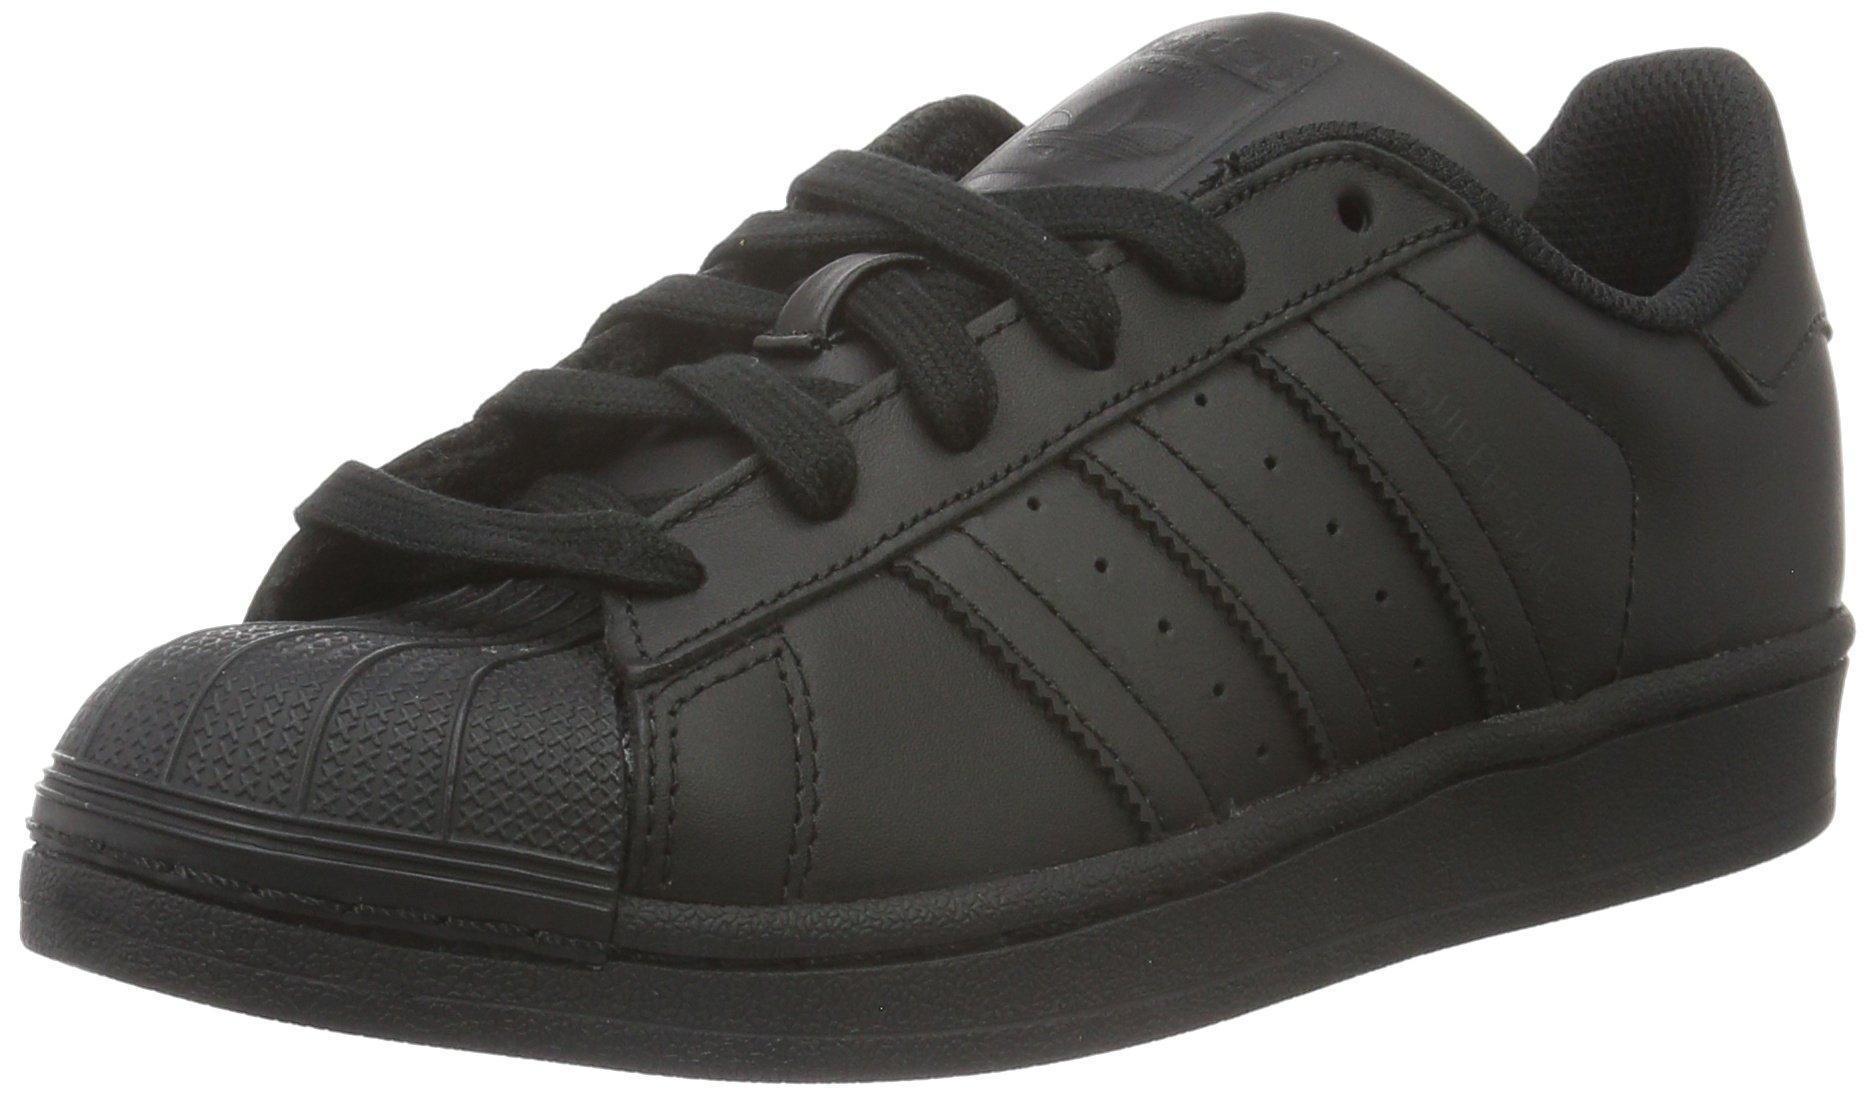 Adidas 2 SuperstarSneakers core Mixte Black Eu Black36 3 Originals Basses AdulteNoircore eWEHYD29I